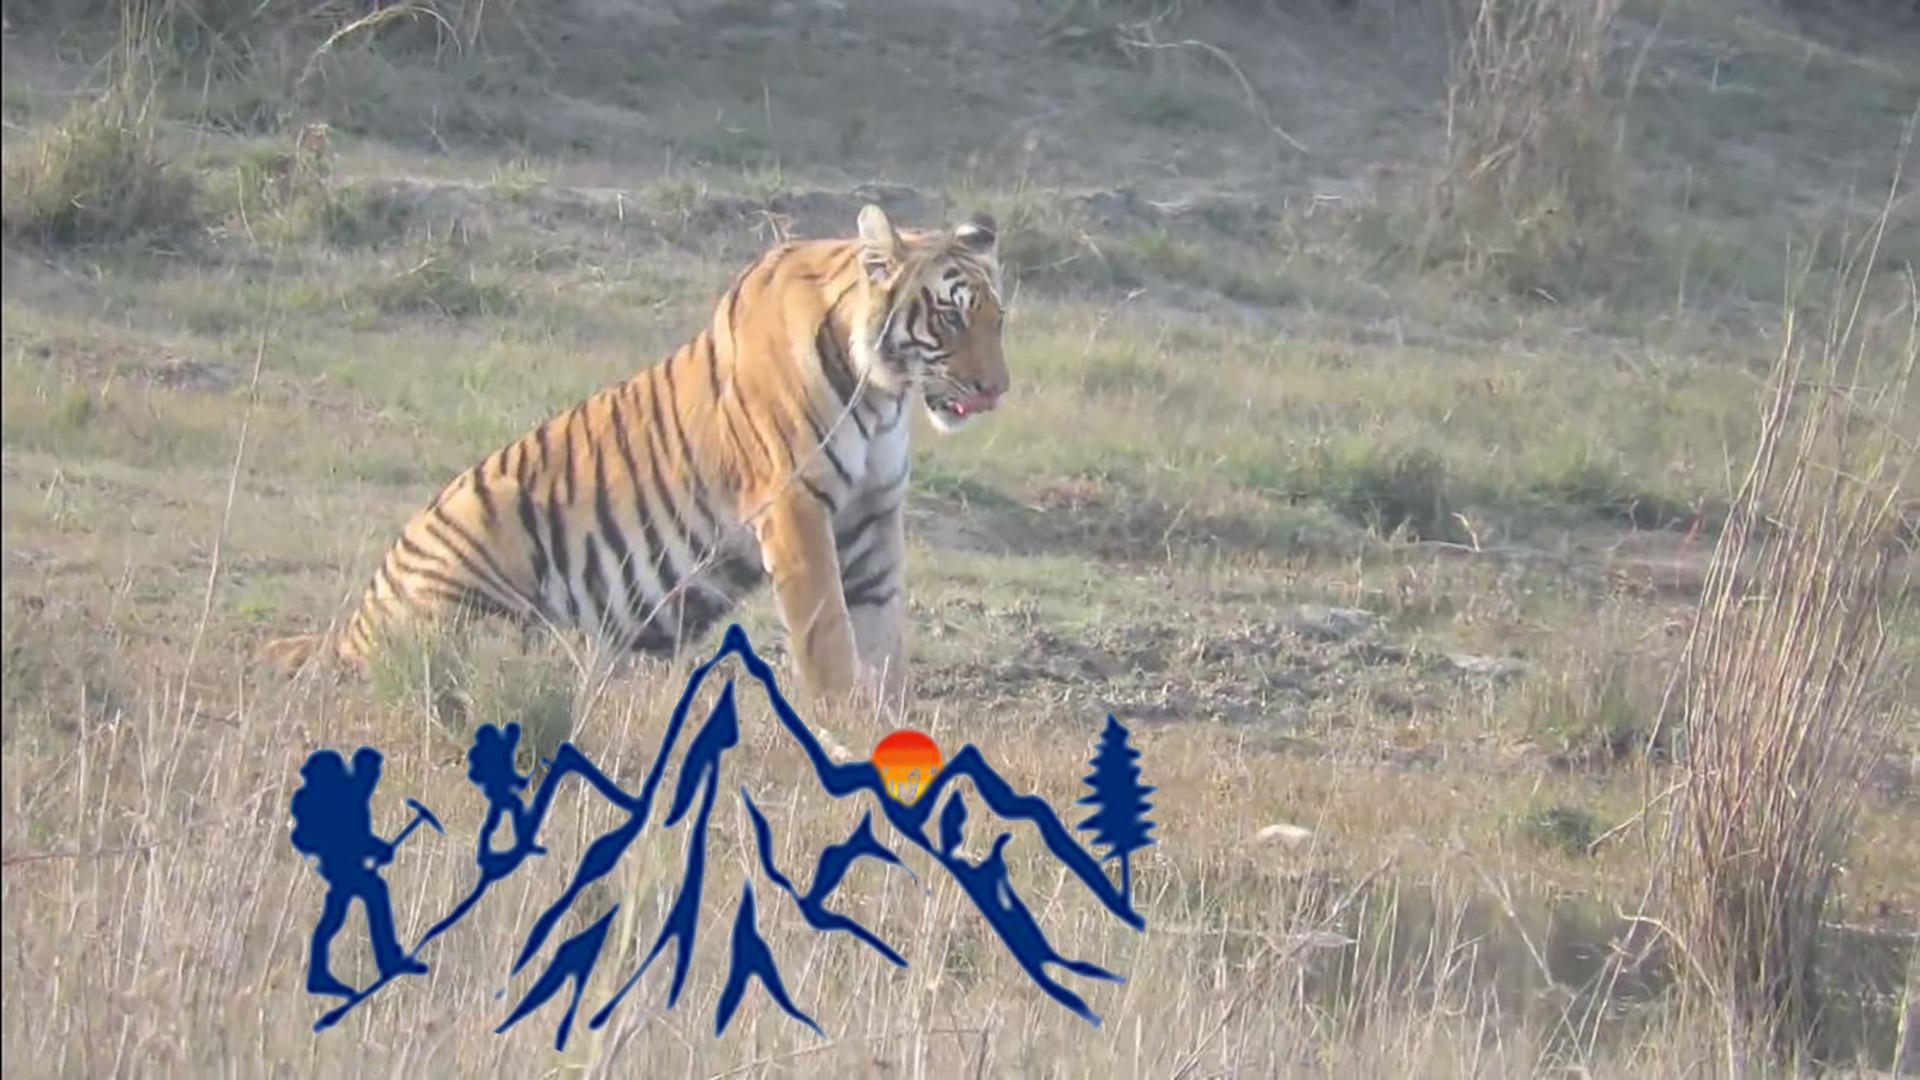 Bardia National Park Wildlife and Jungle Tour